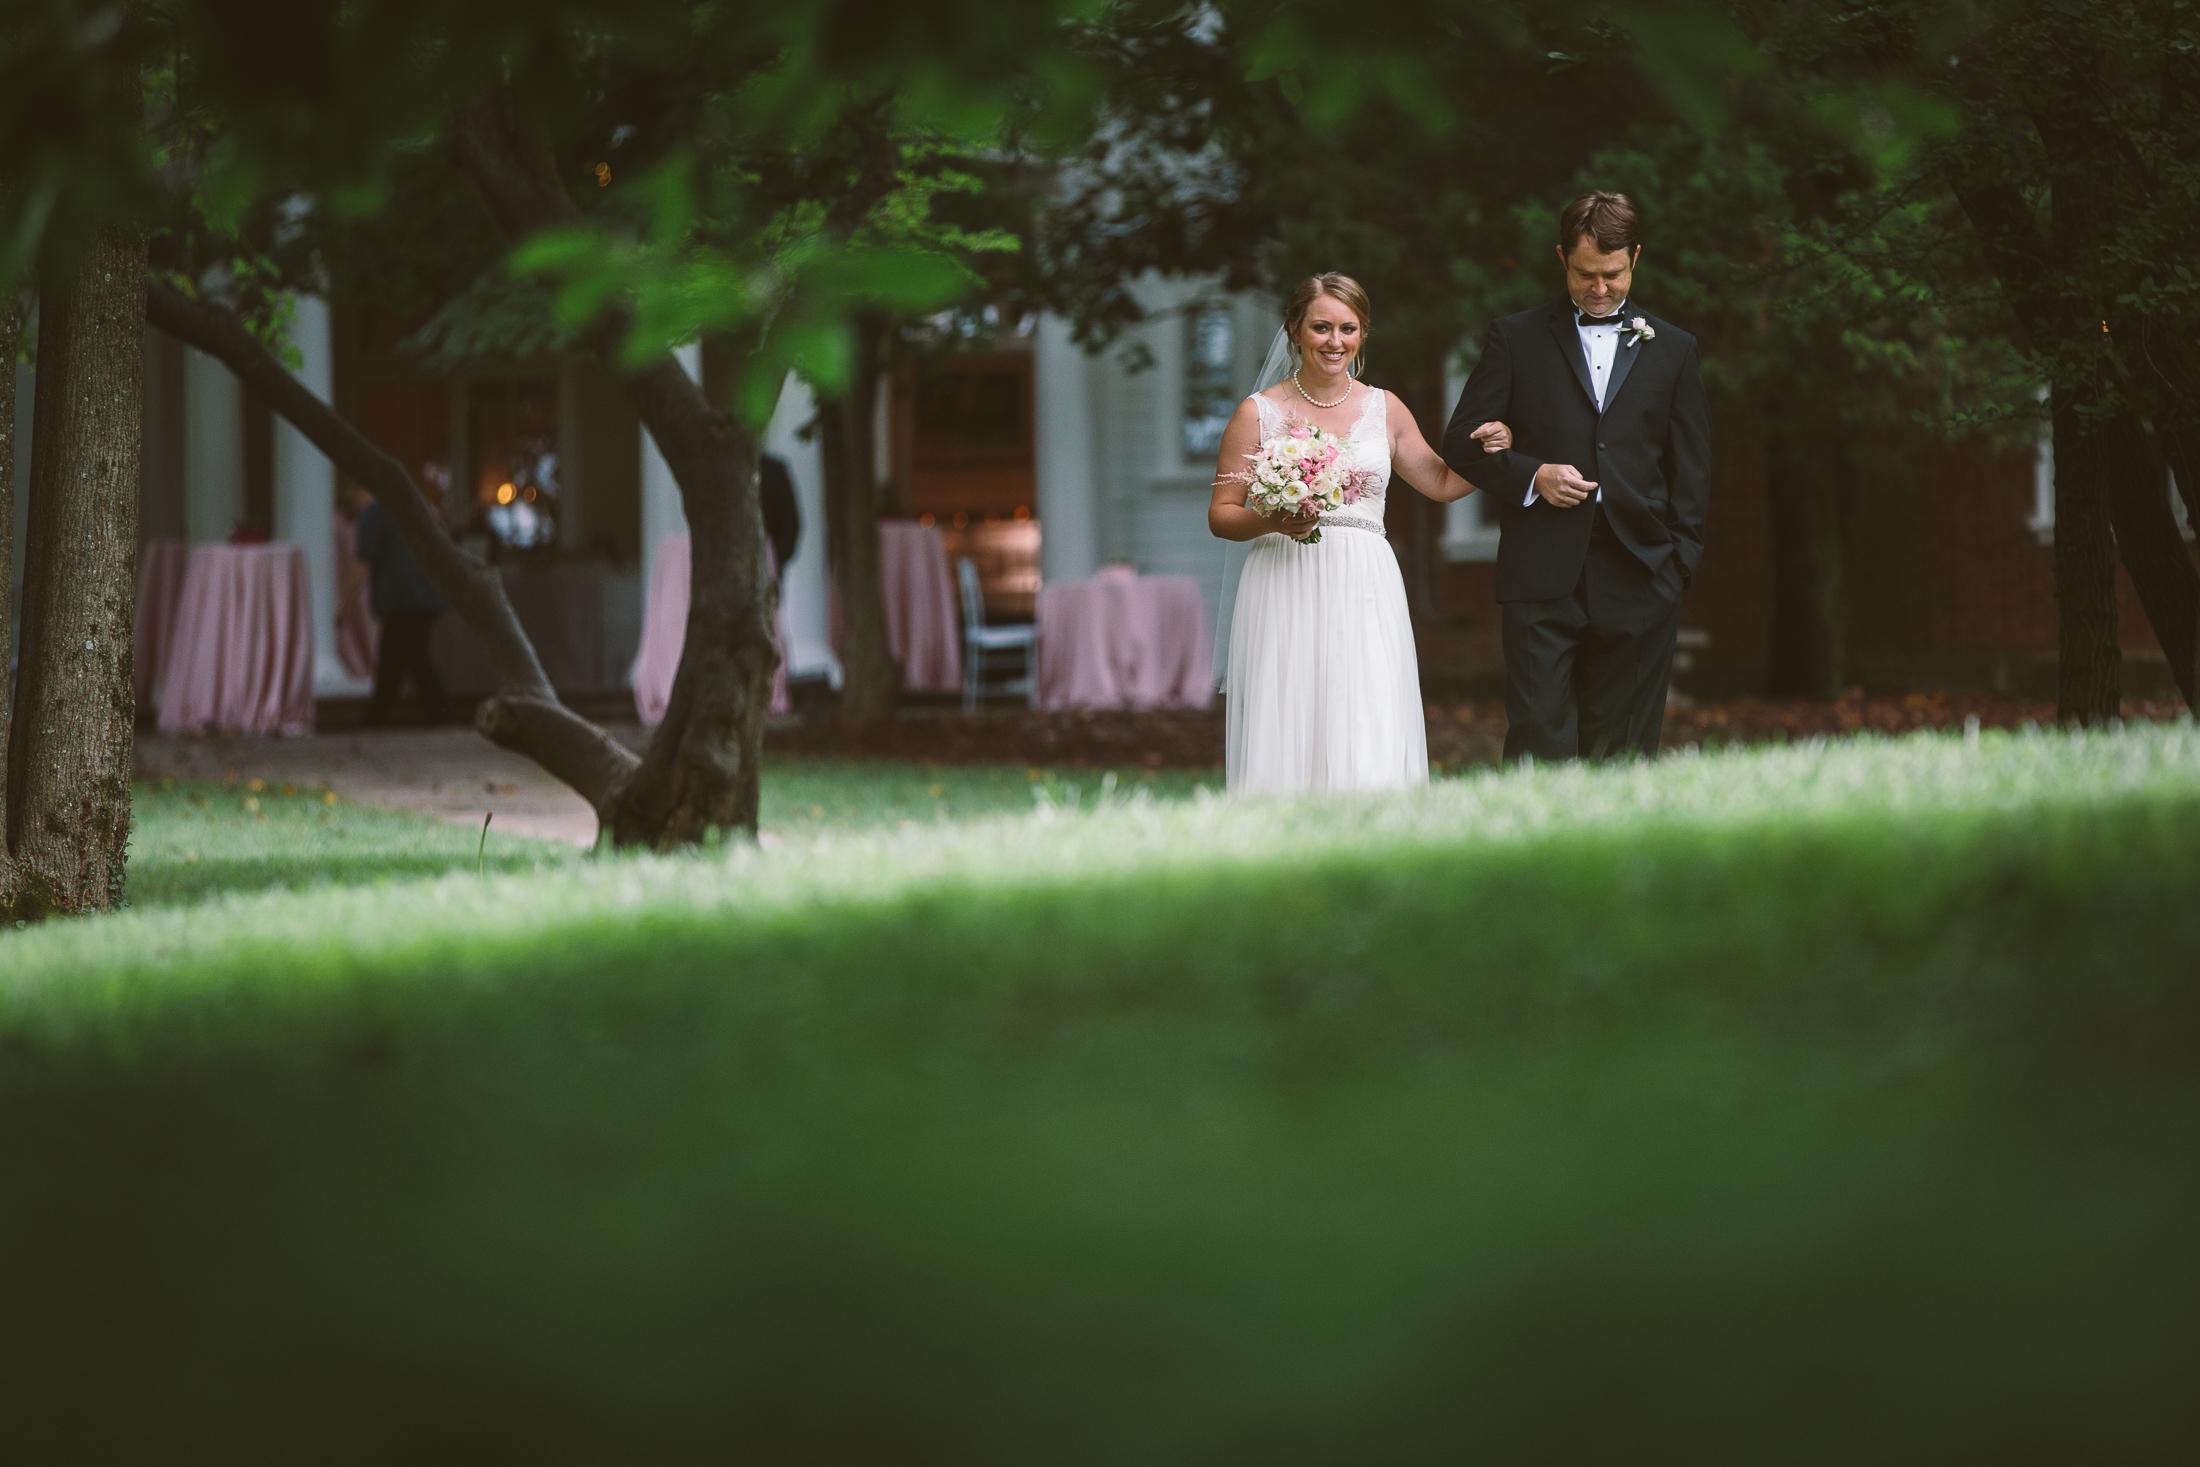 woodend-wedding-1365.jpg